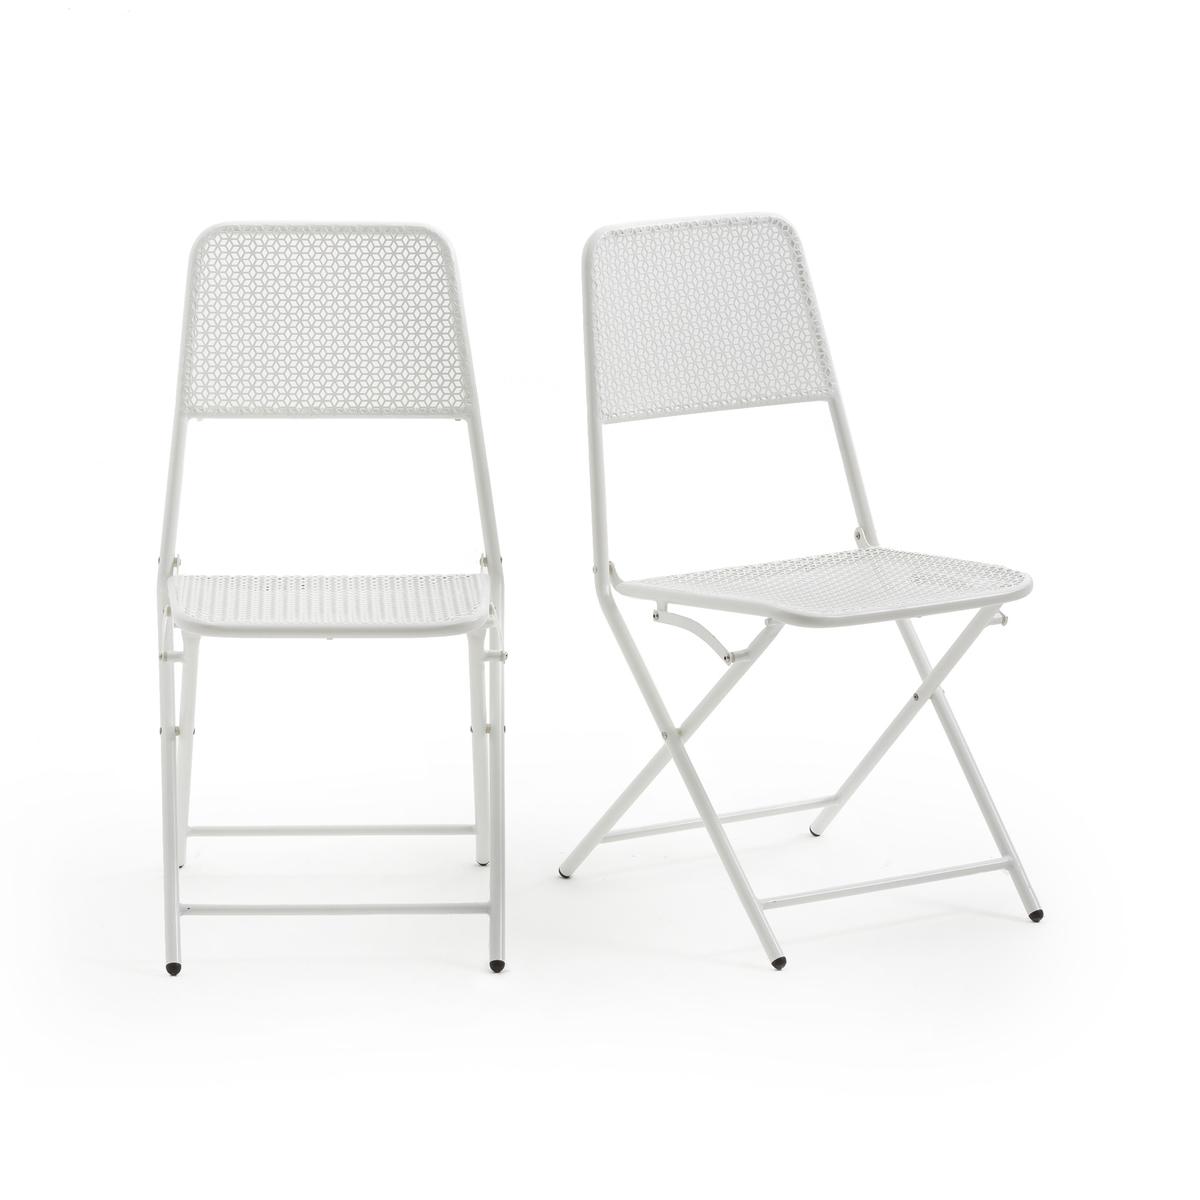 2 садовых стула OSLO